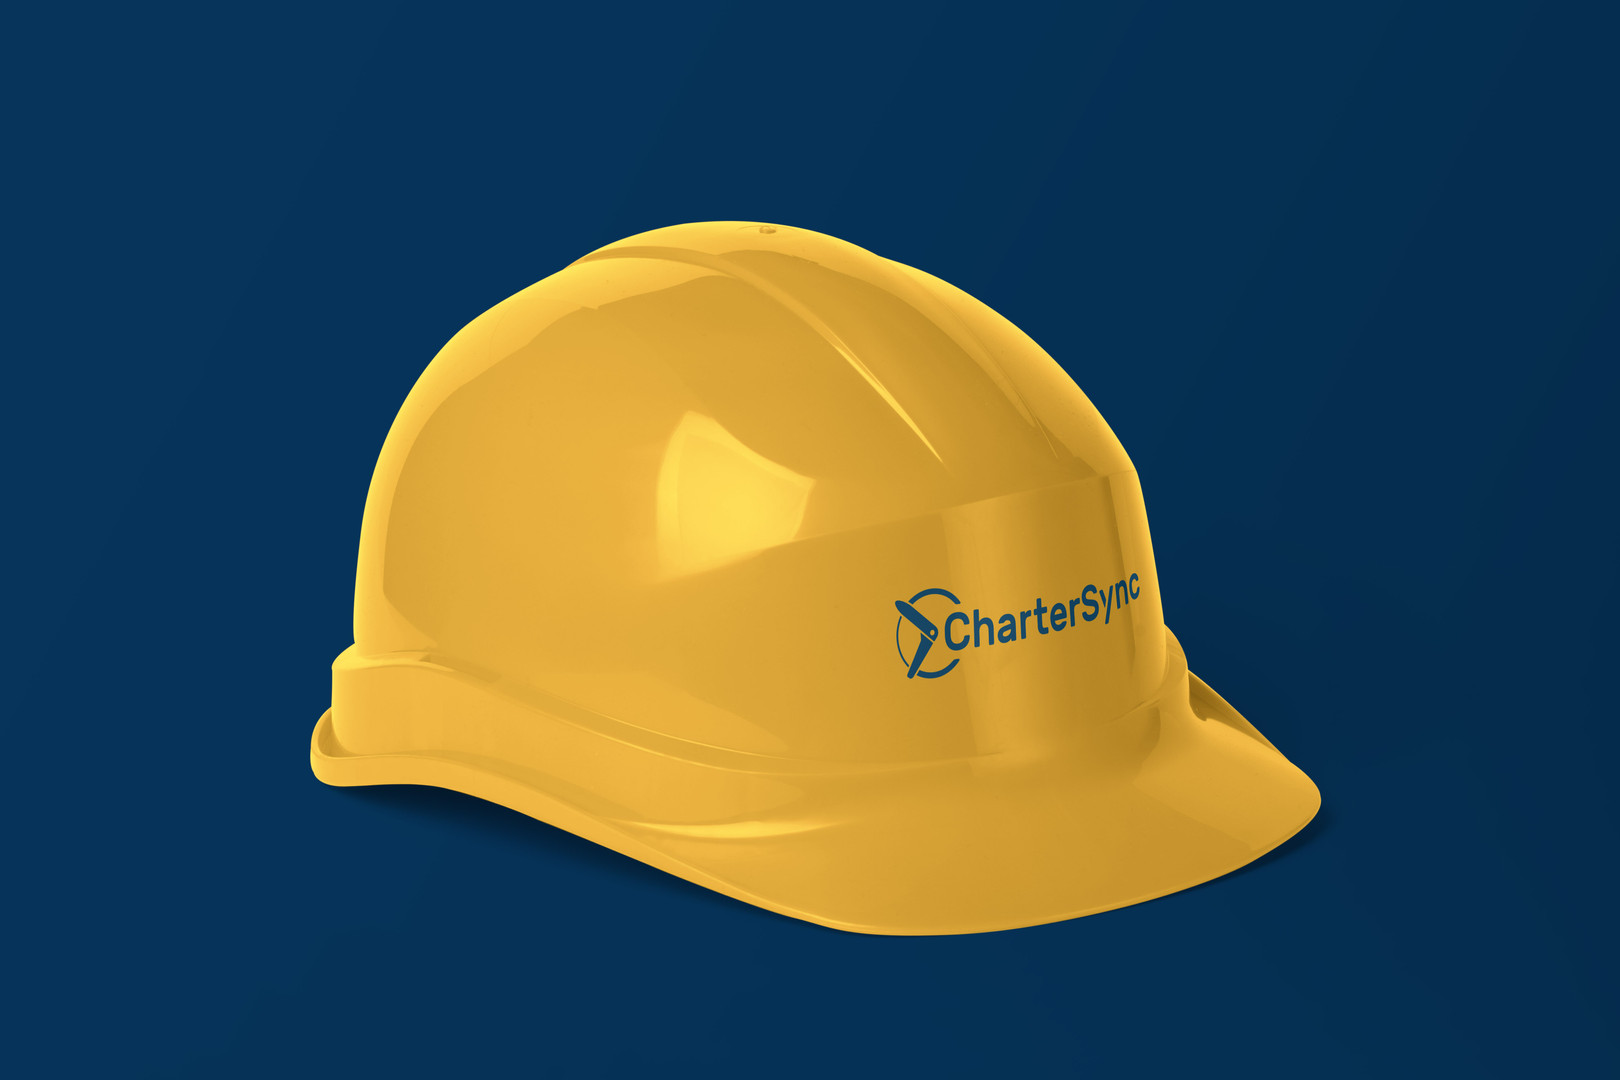 CharterSync Helmet.jpg